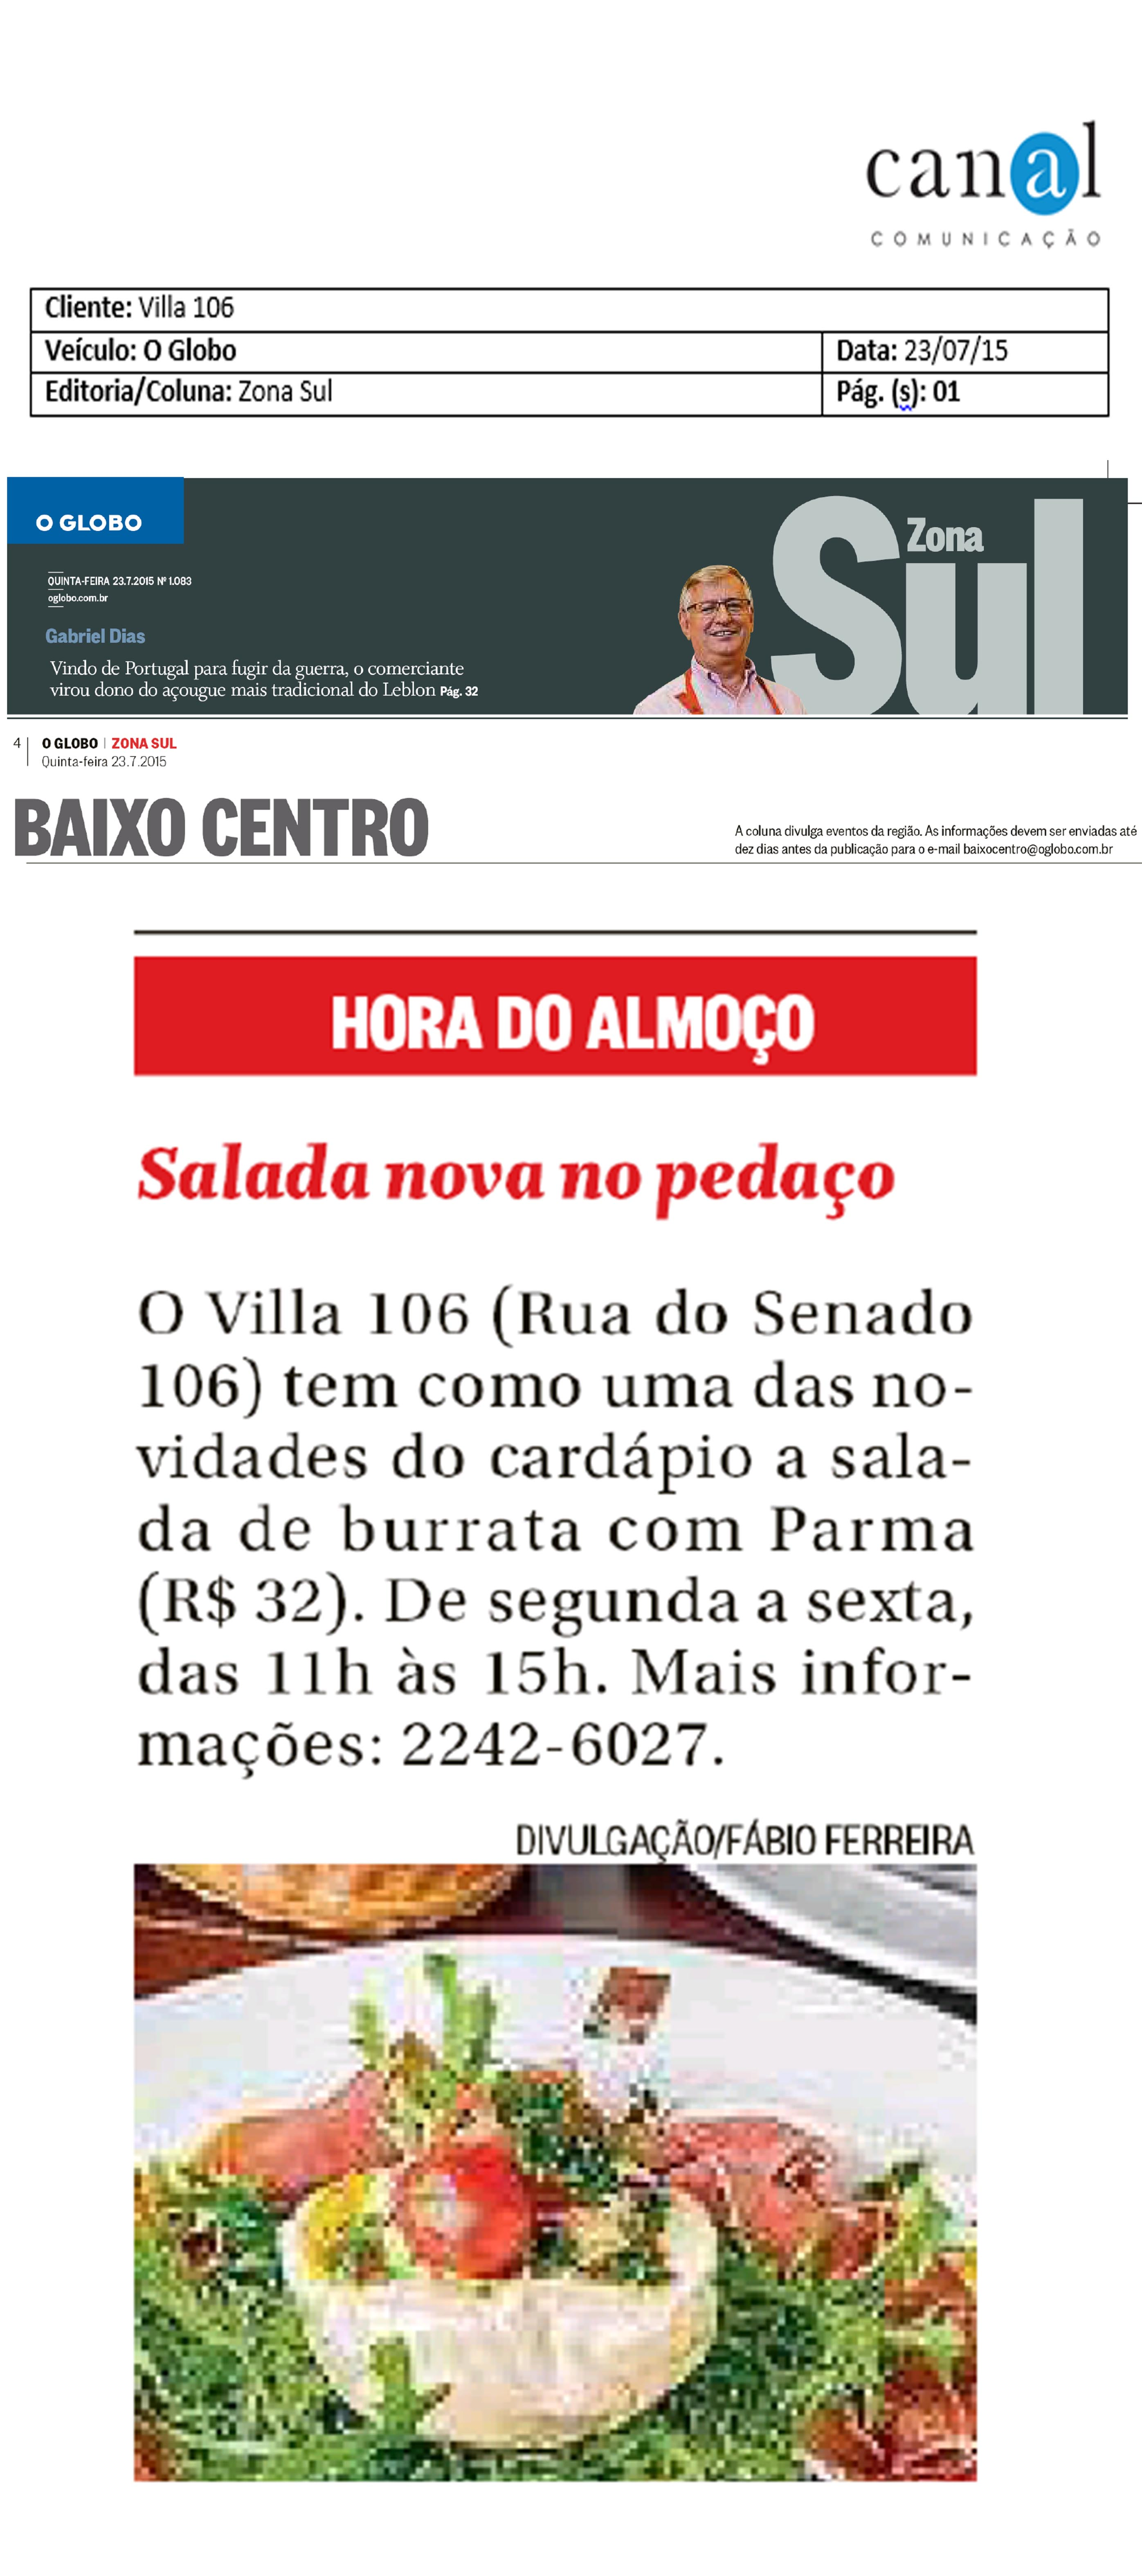 Villa-106_O-Globo_Zona-Sul_23-07-2015